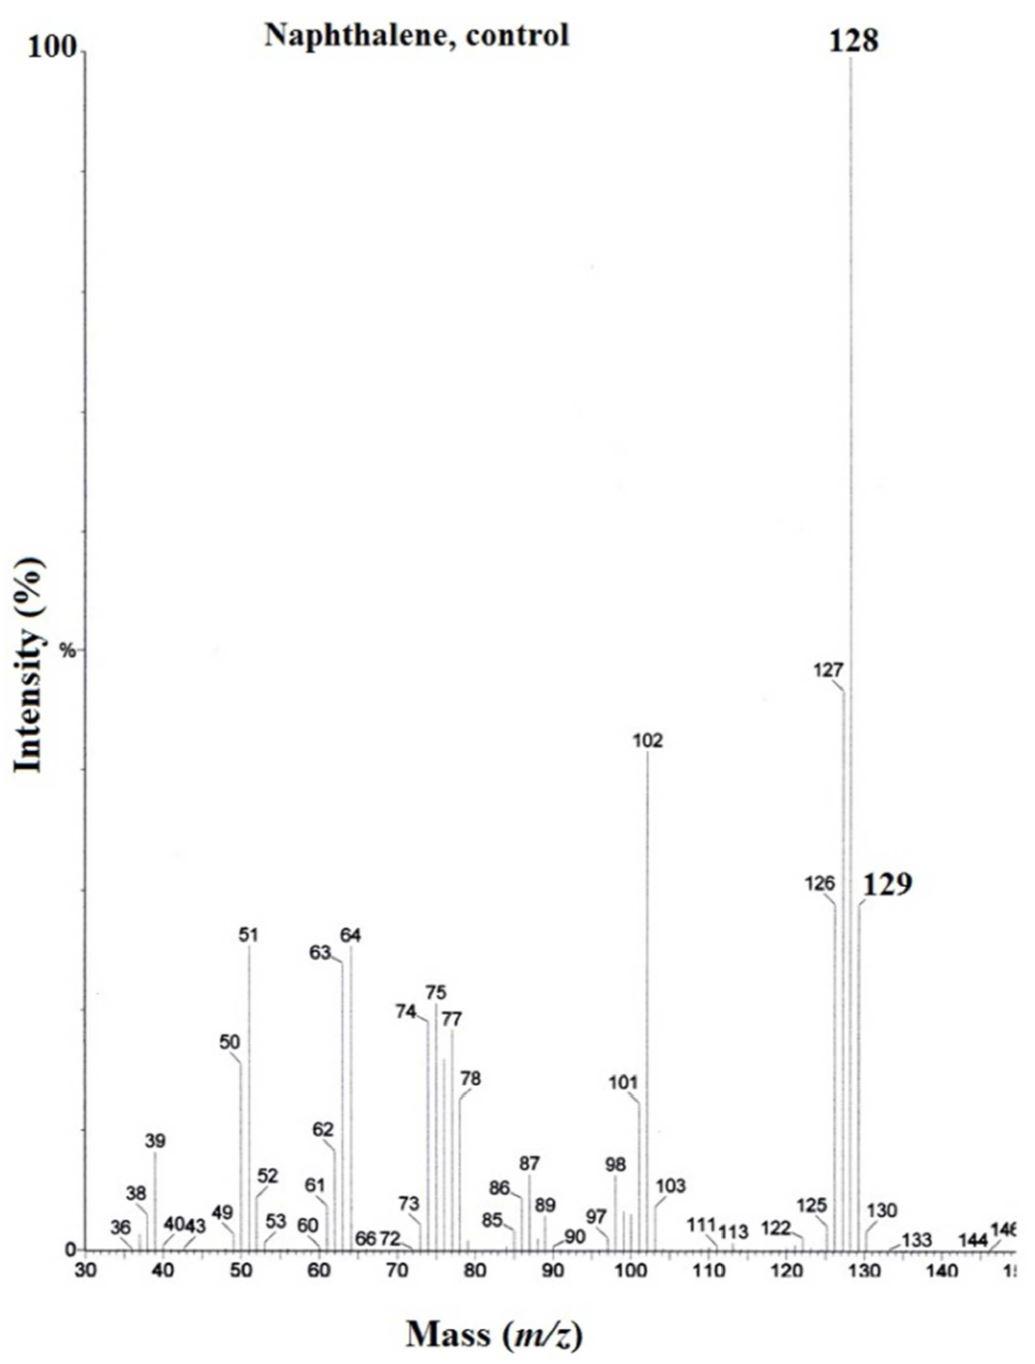 Evaluation of Isotopic Abundance Ratio in Naphthalene